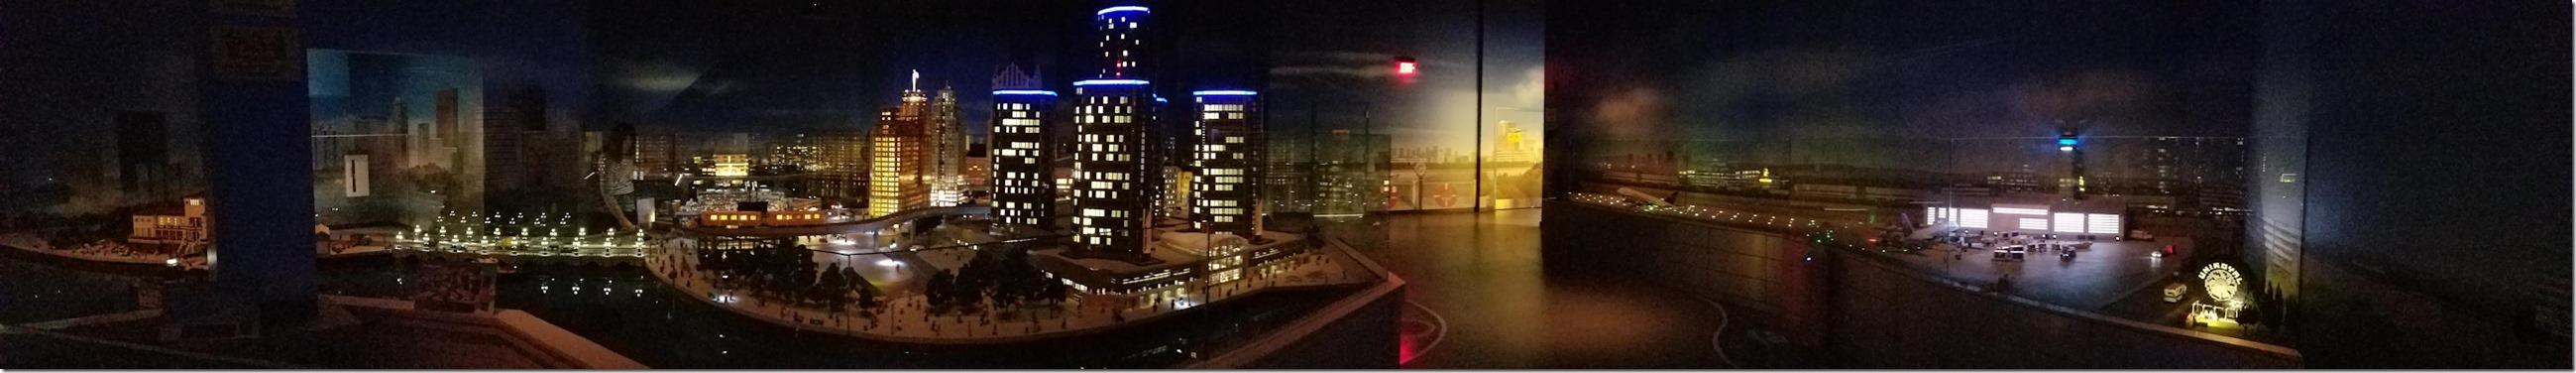 Detroit Lego City Panorama